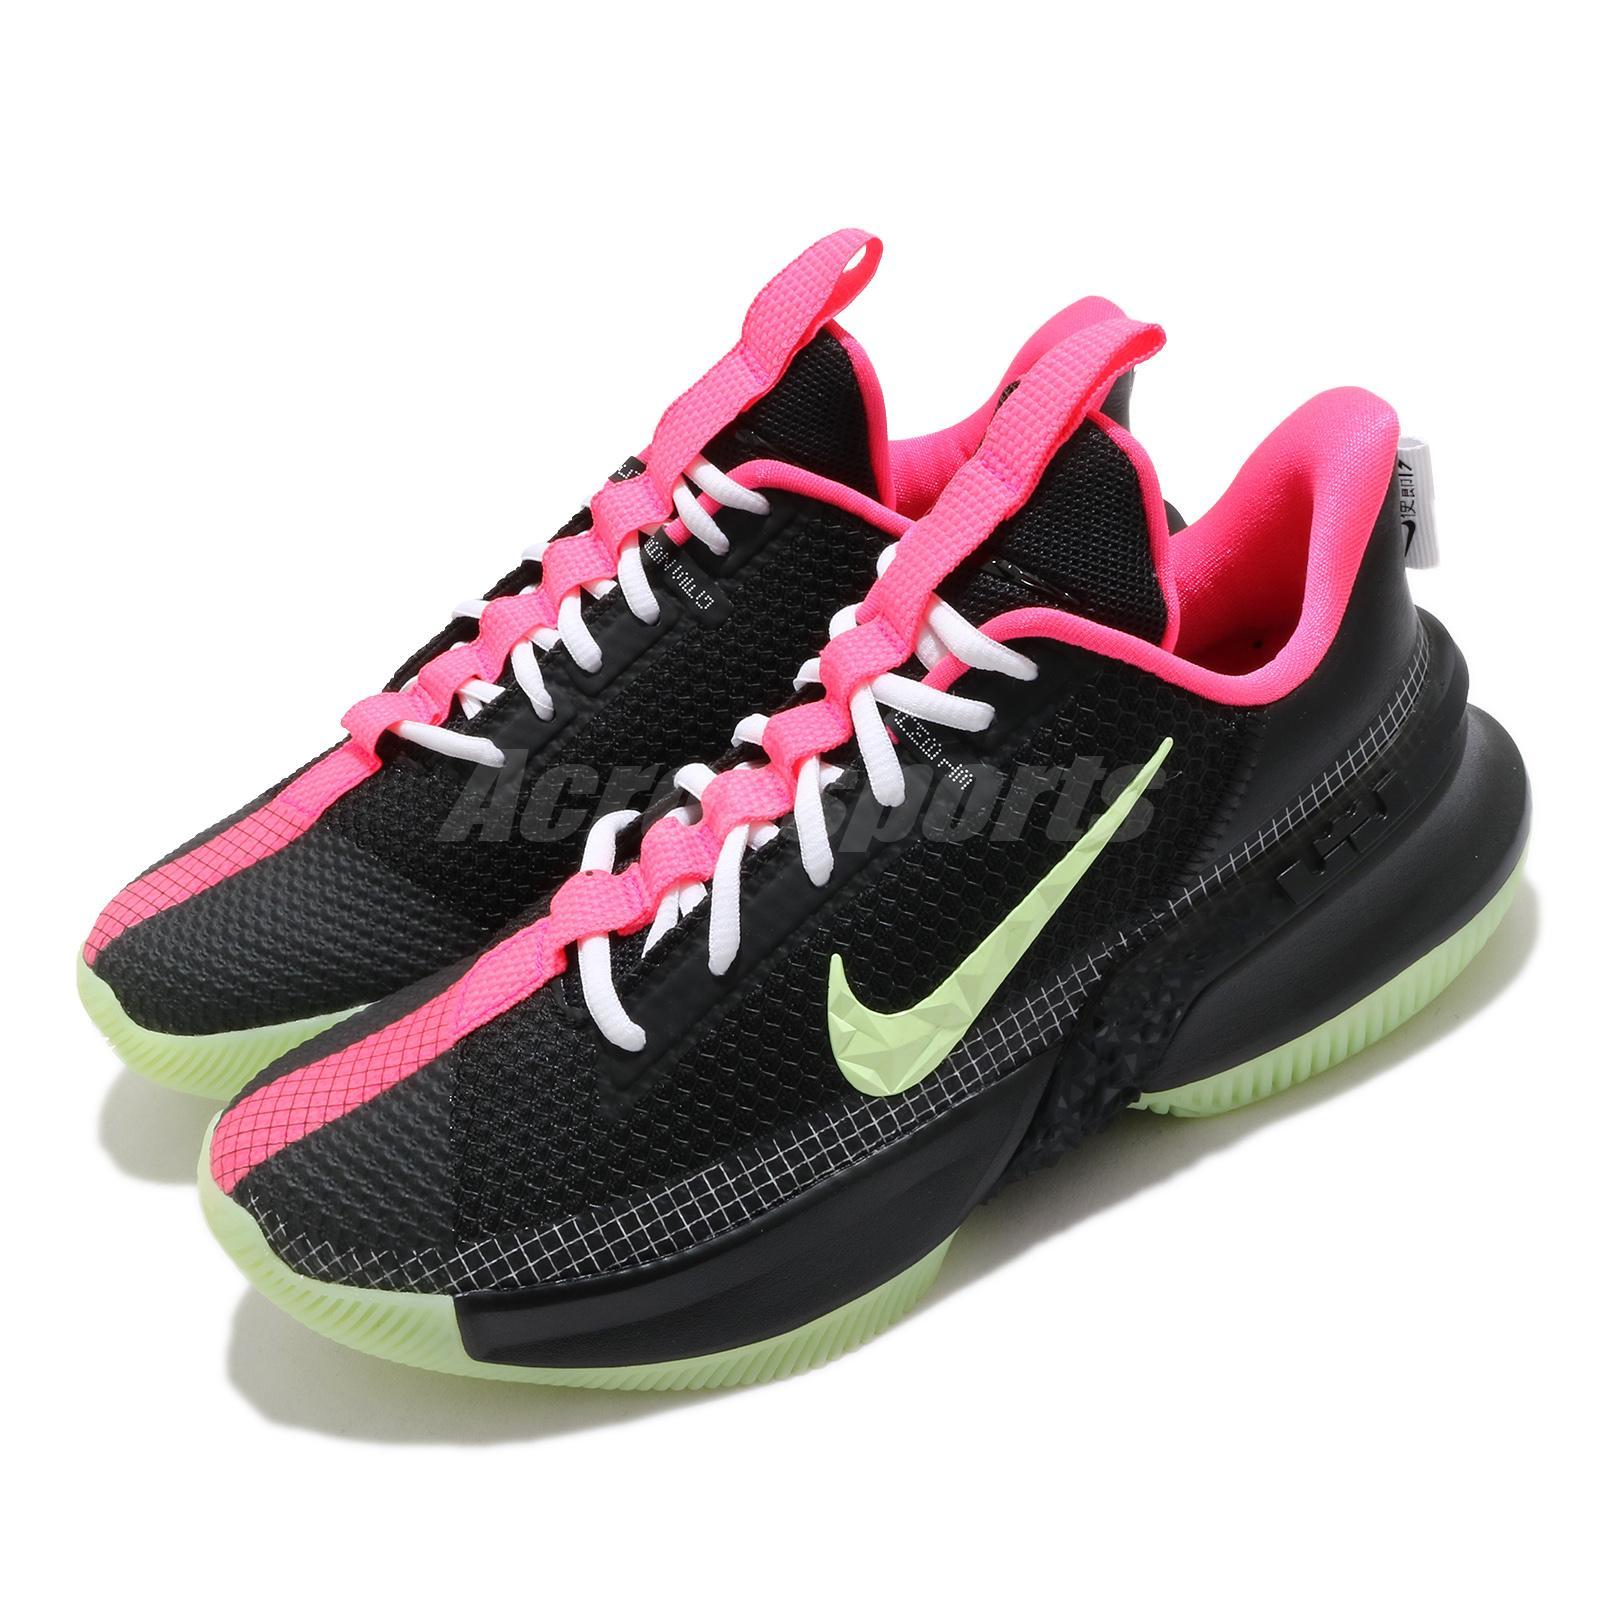 Nike LeBron Ambassador XIII 13 James